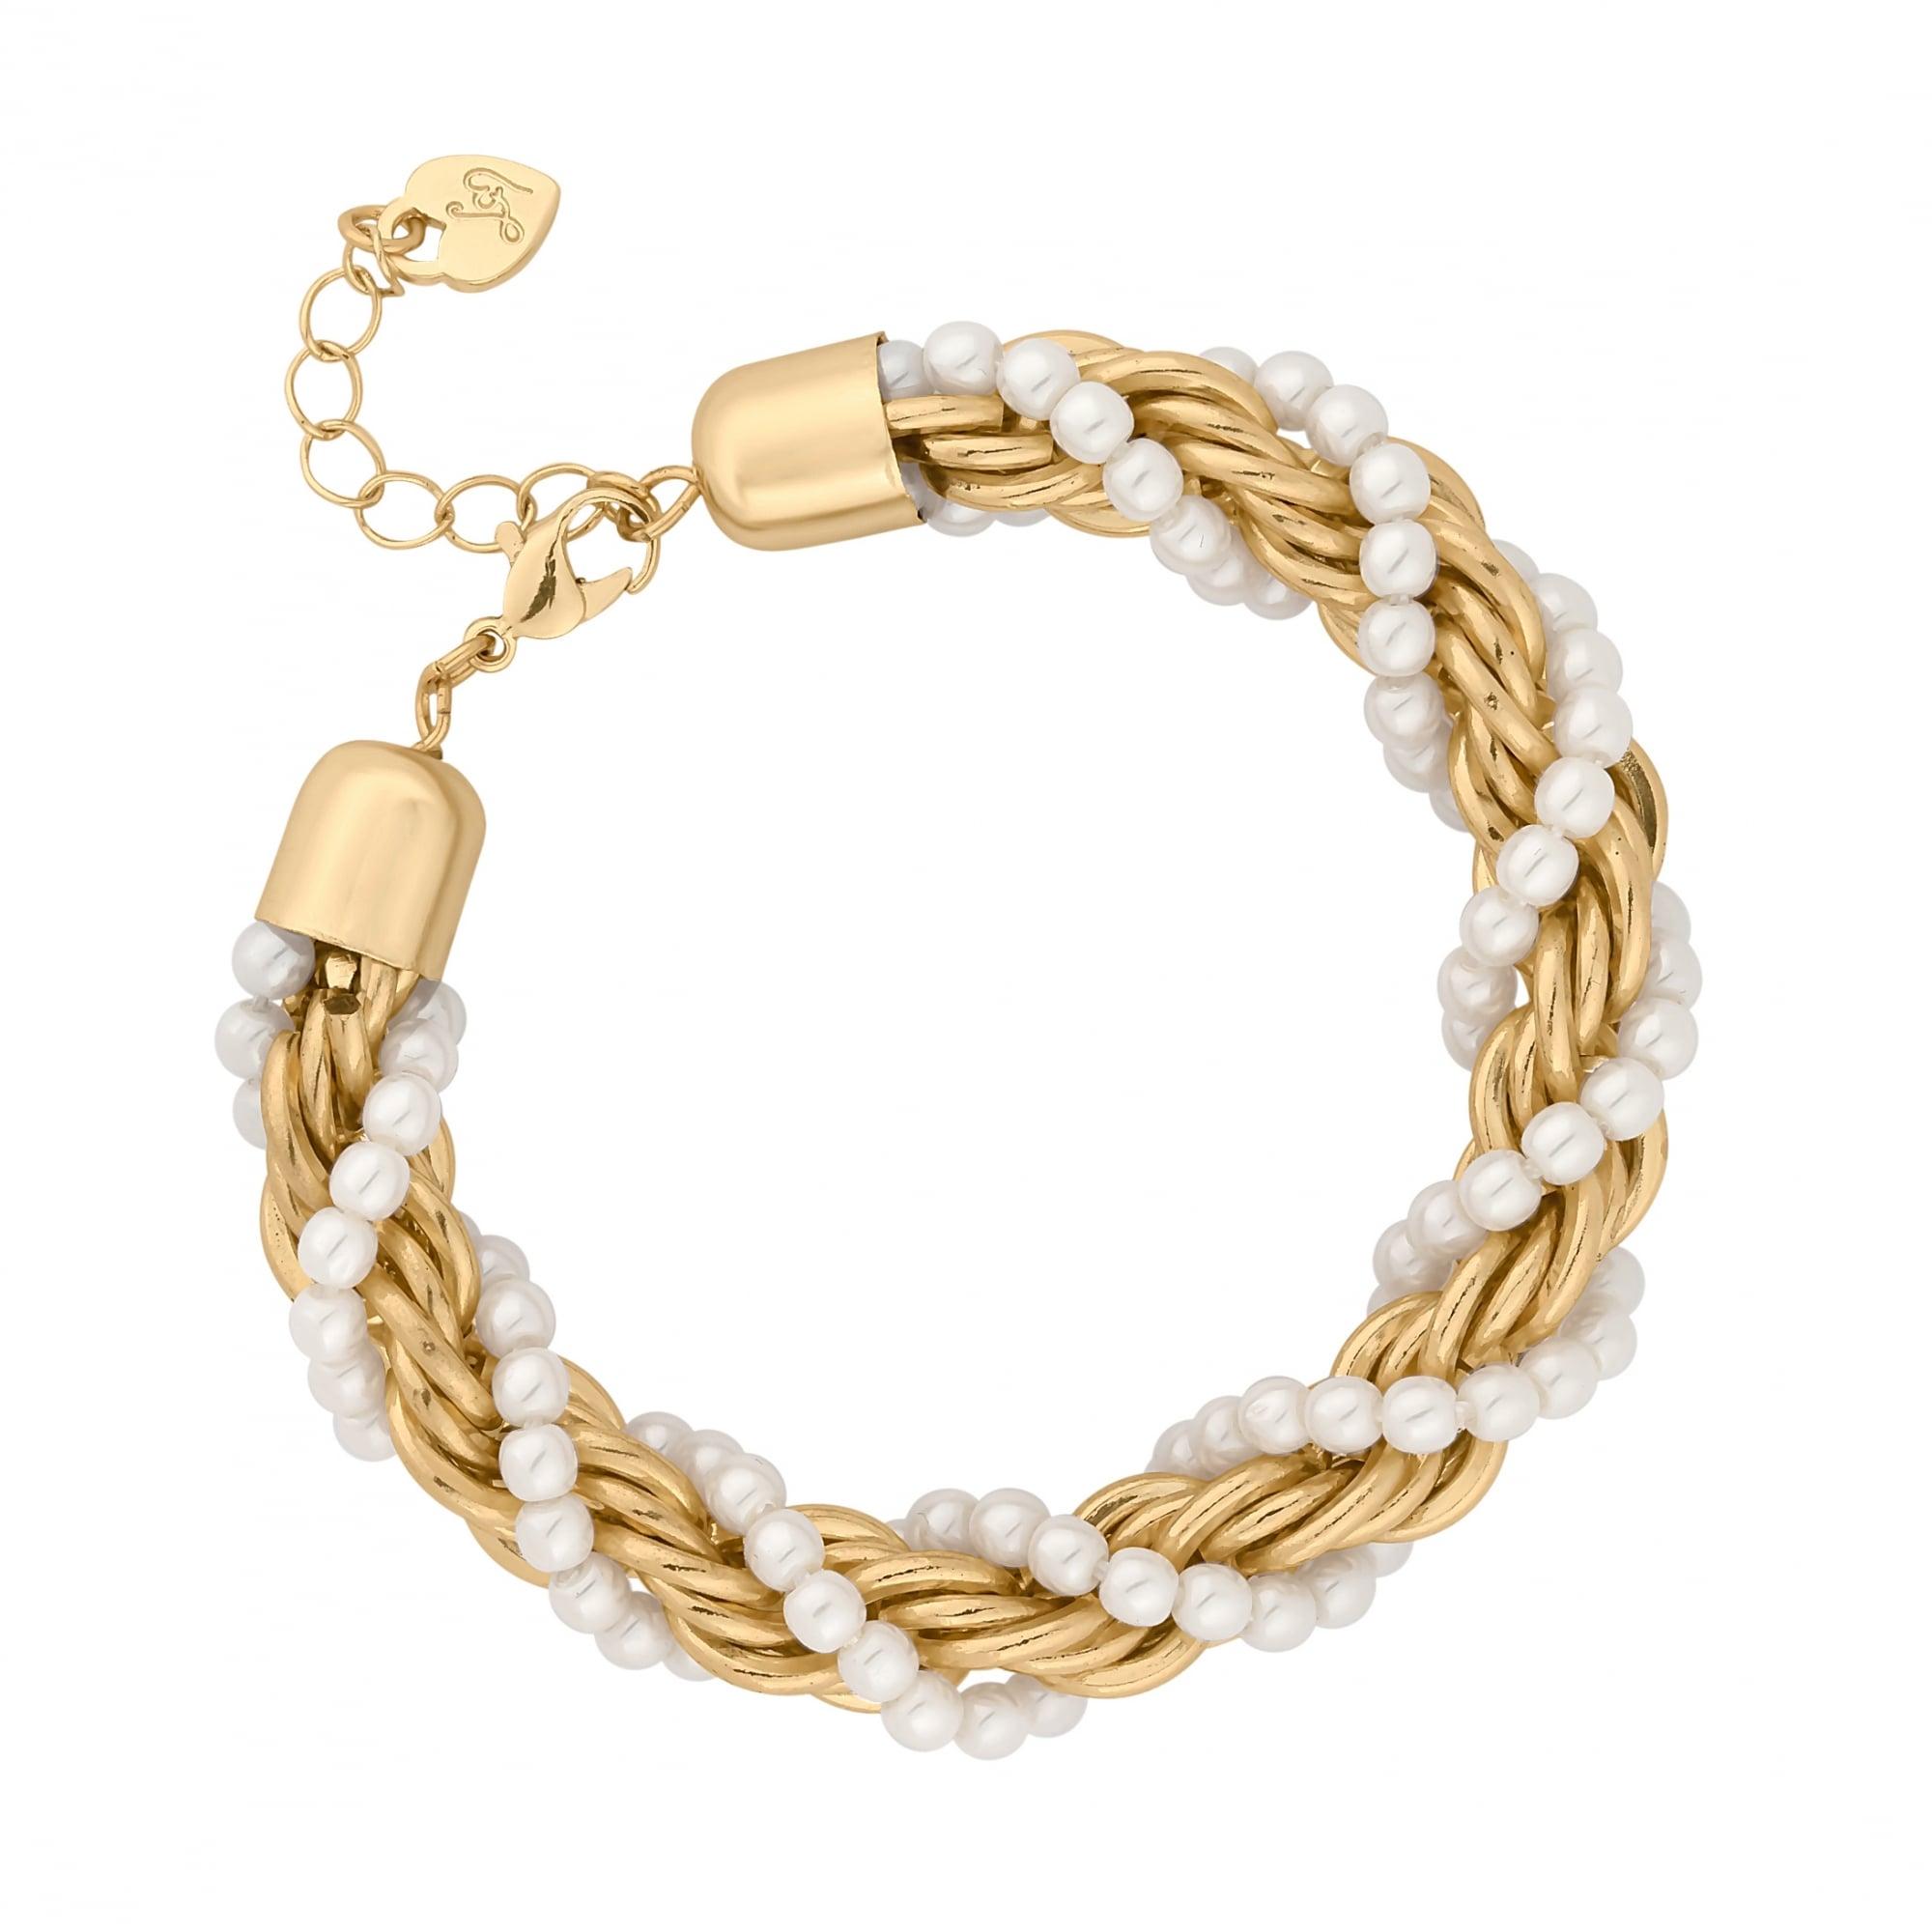 28a532b0c88 Lipsy Gold Pearl Twist Chain Bracelet - Jewellery from Jon Richard UK